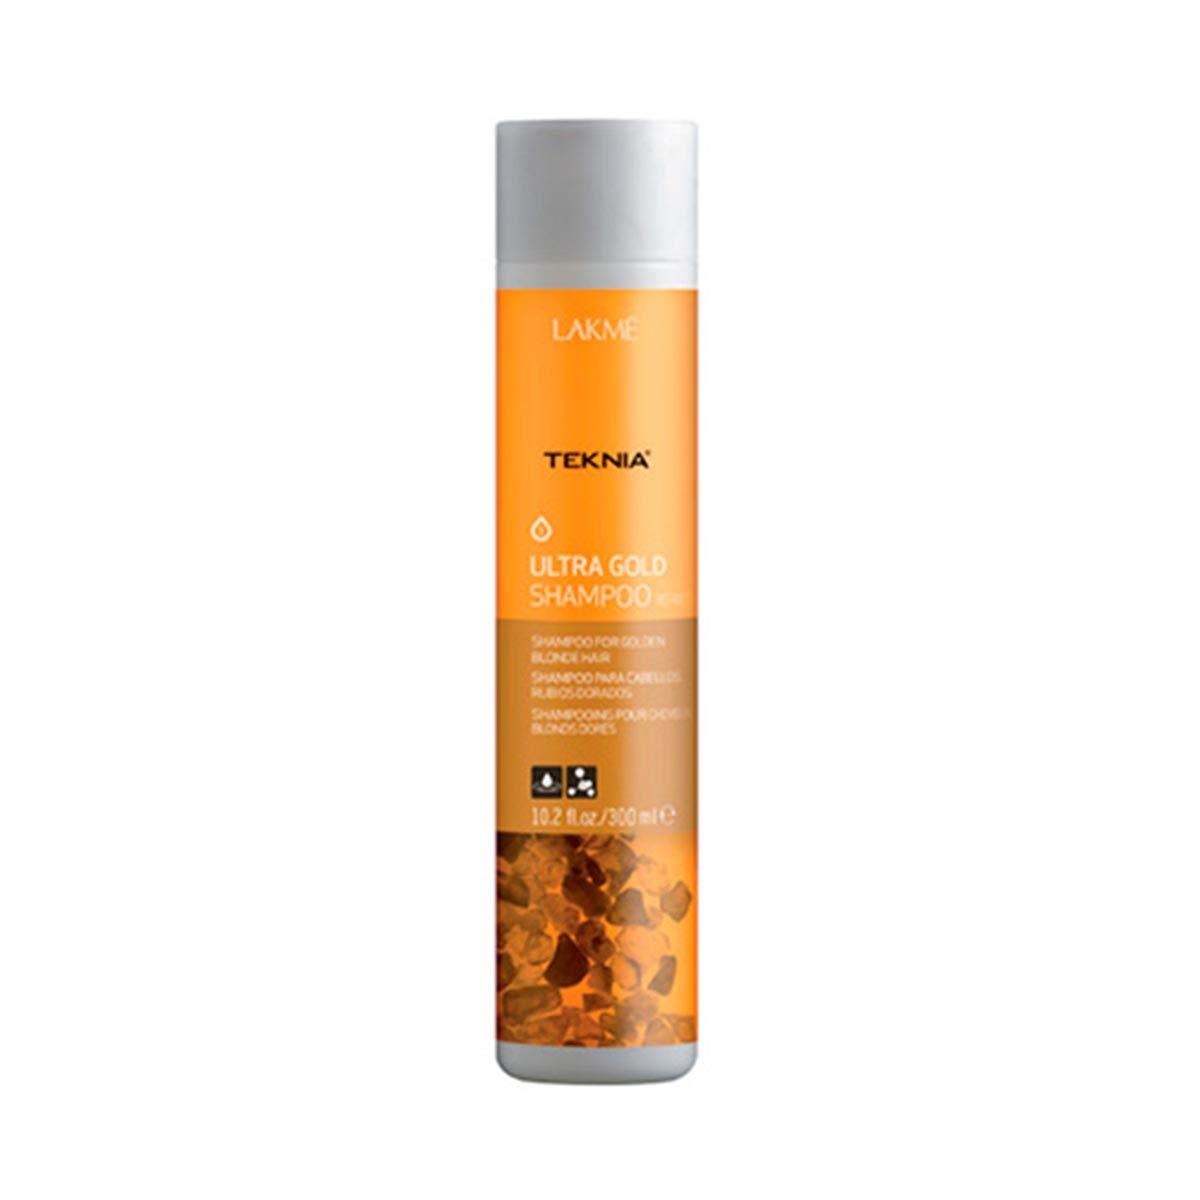 LAKME Teknia Ultra Gold Shampoo, 10.2 Fl Oz